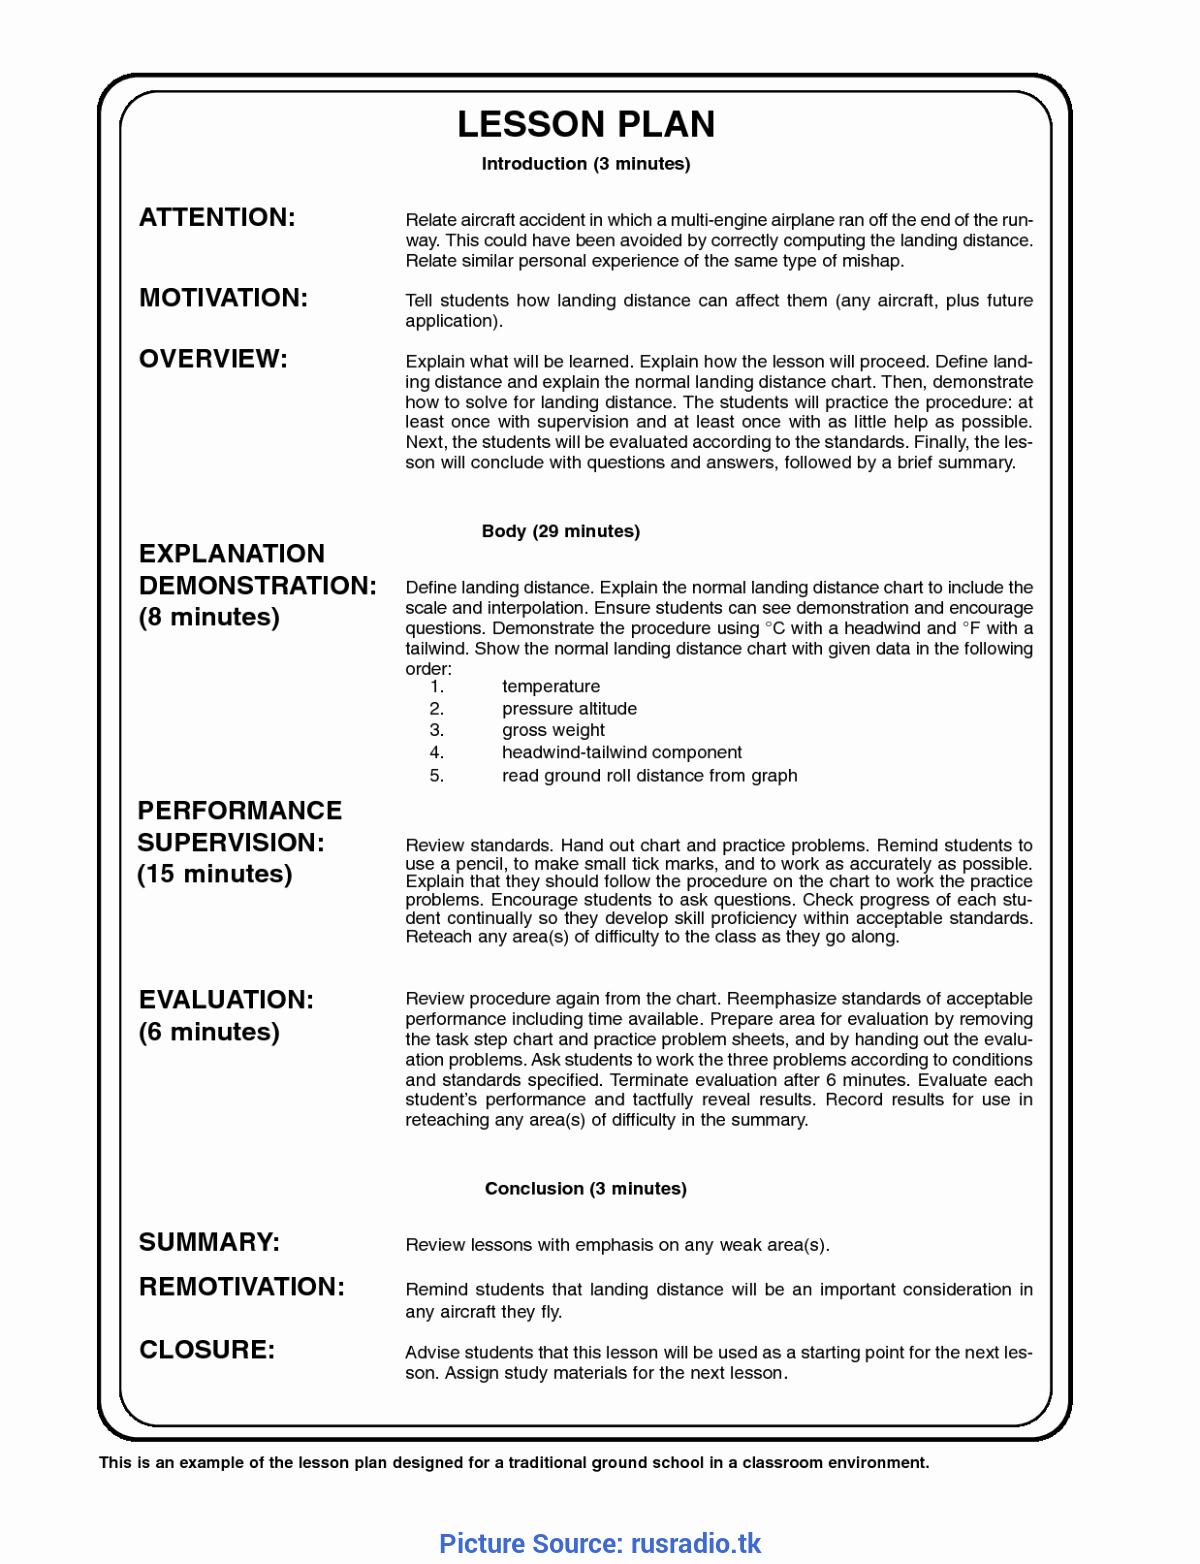 Demo Lesson Plan Template Beautiful Simple Sample Lesson Plan English Preschool Best S